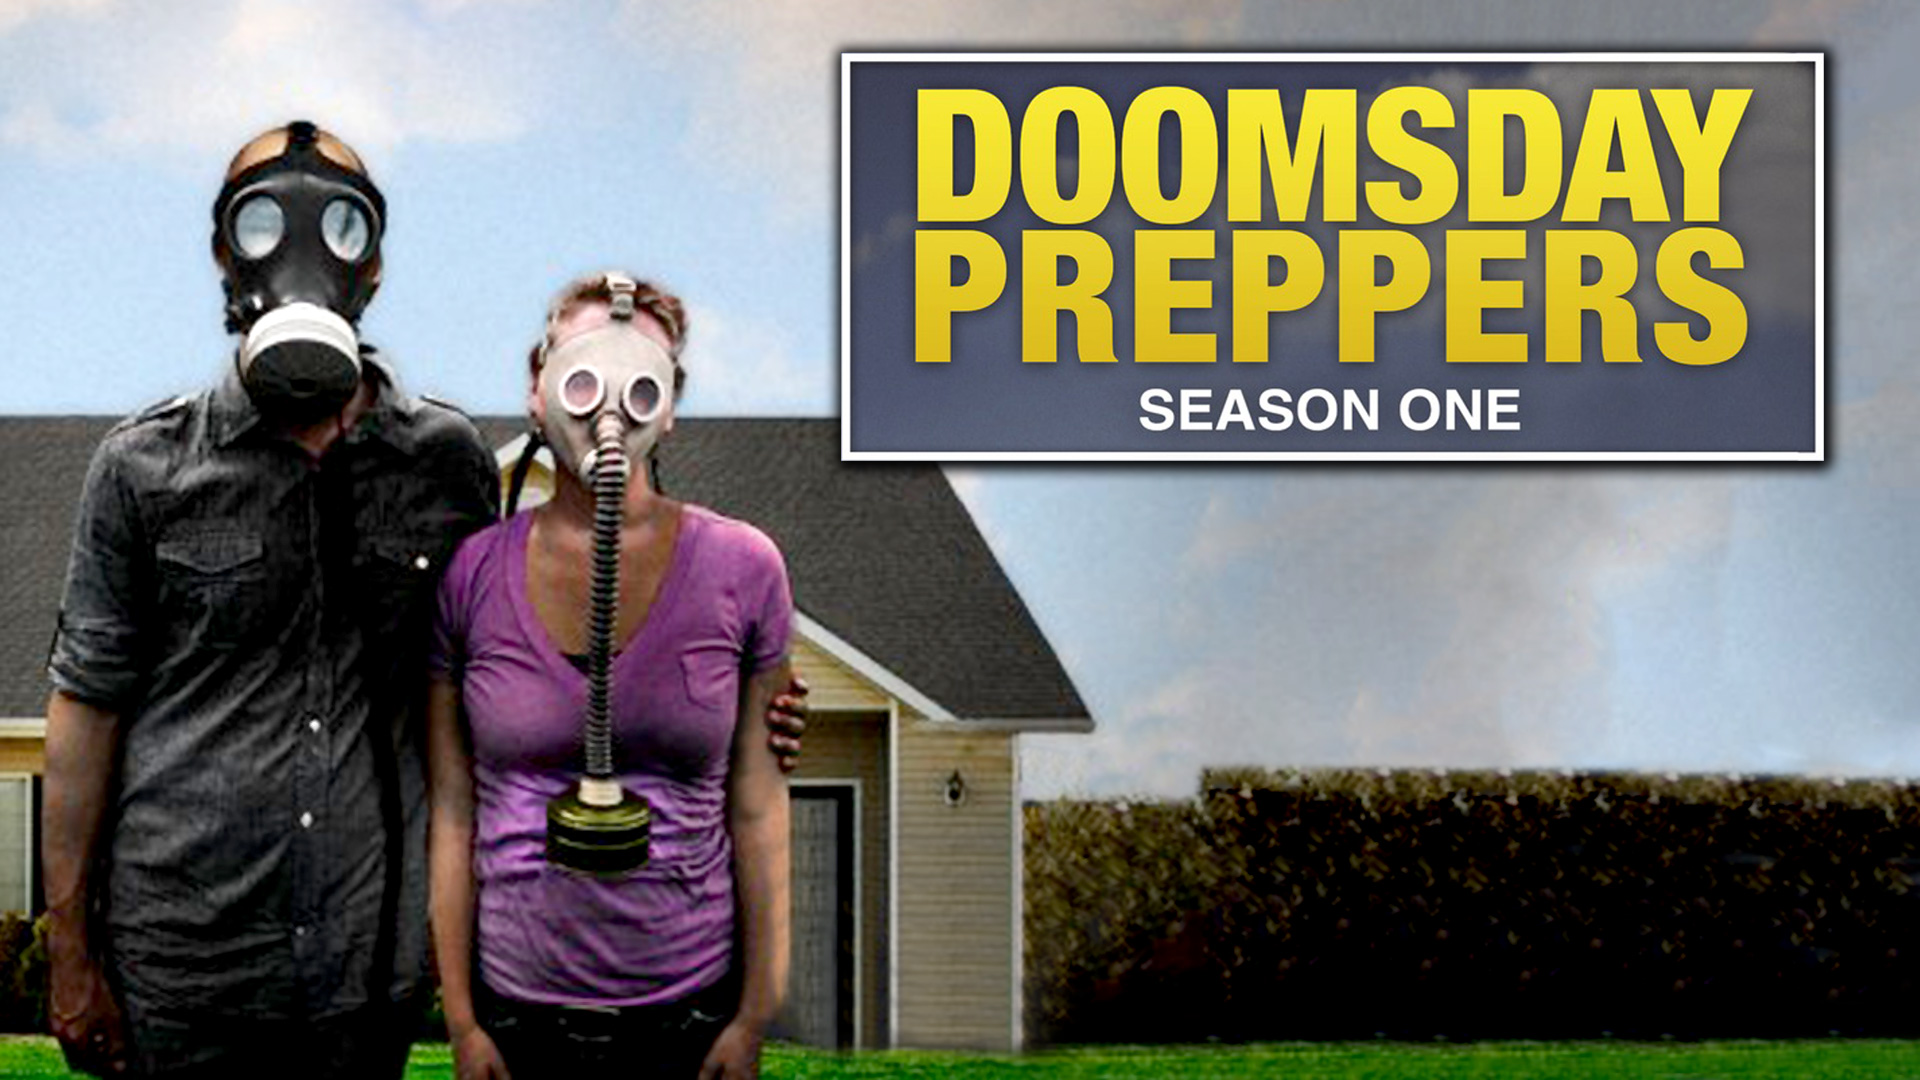 Doomsday Preppers, Season 1